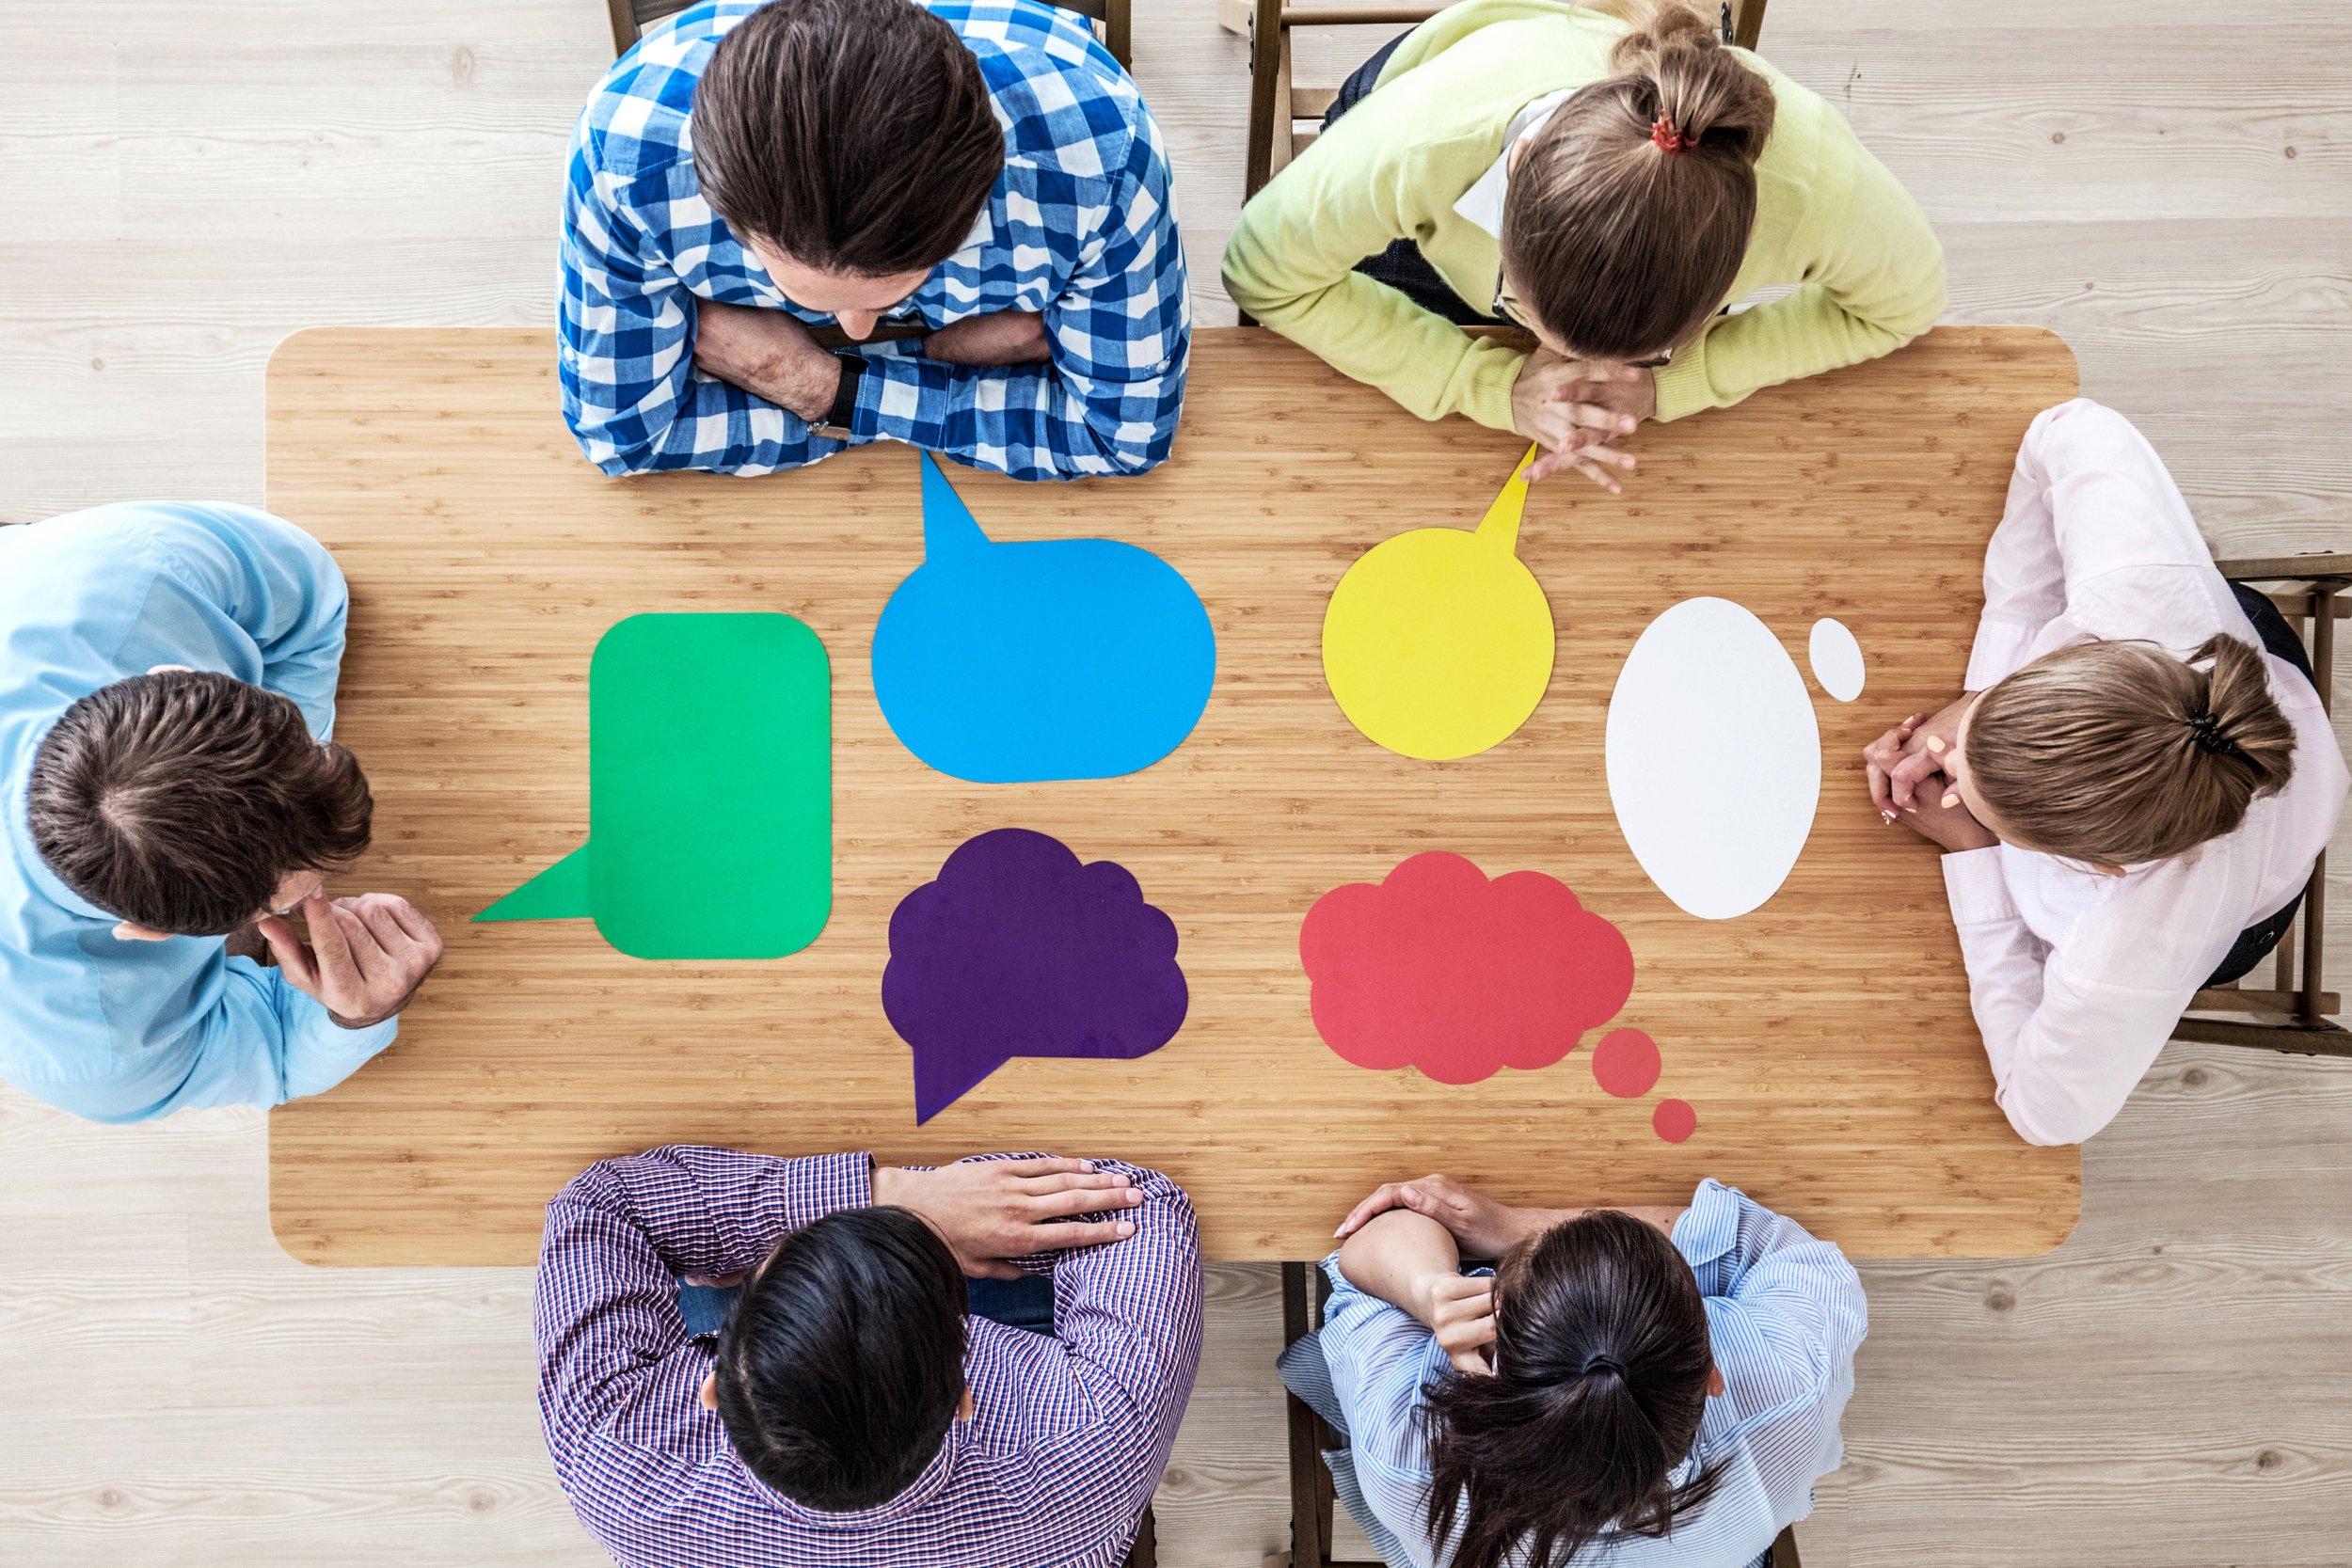 Colorful_Table_Meeting.jpg